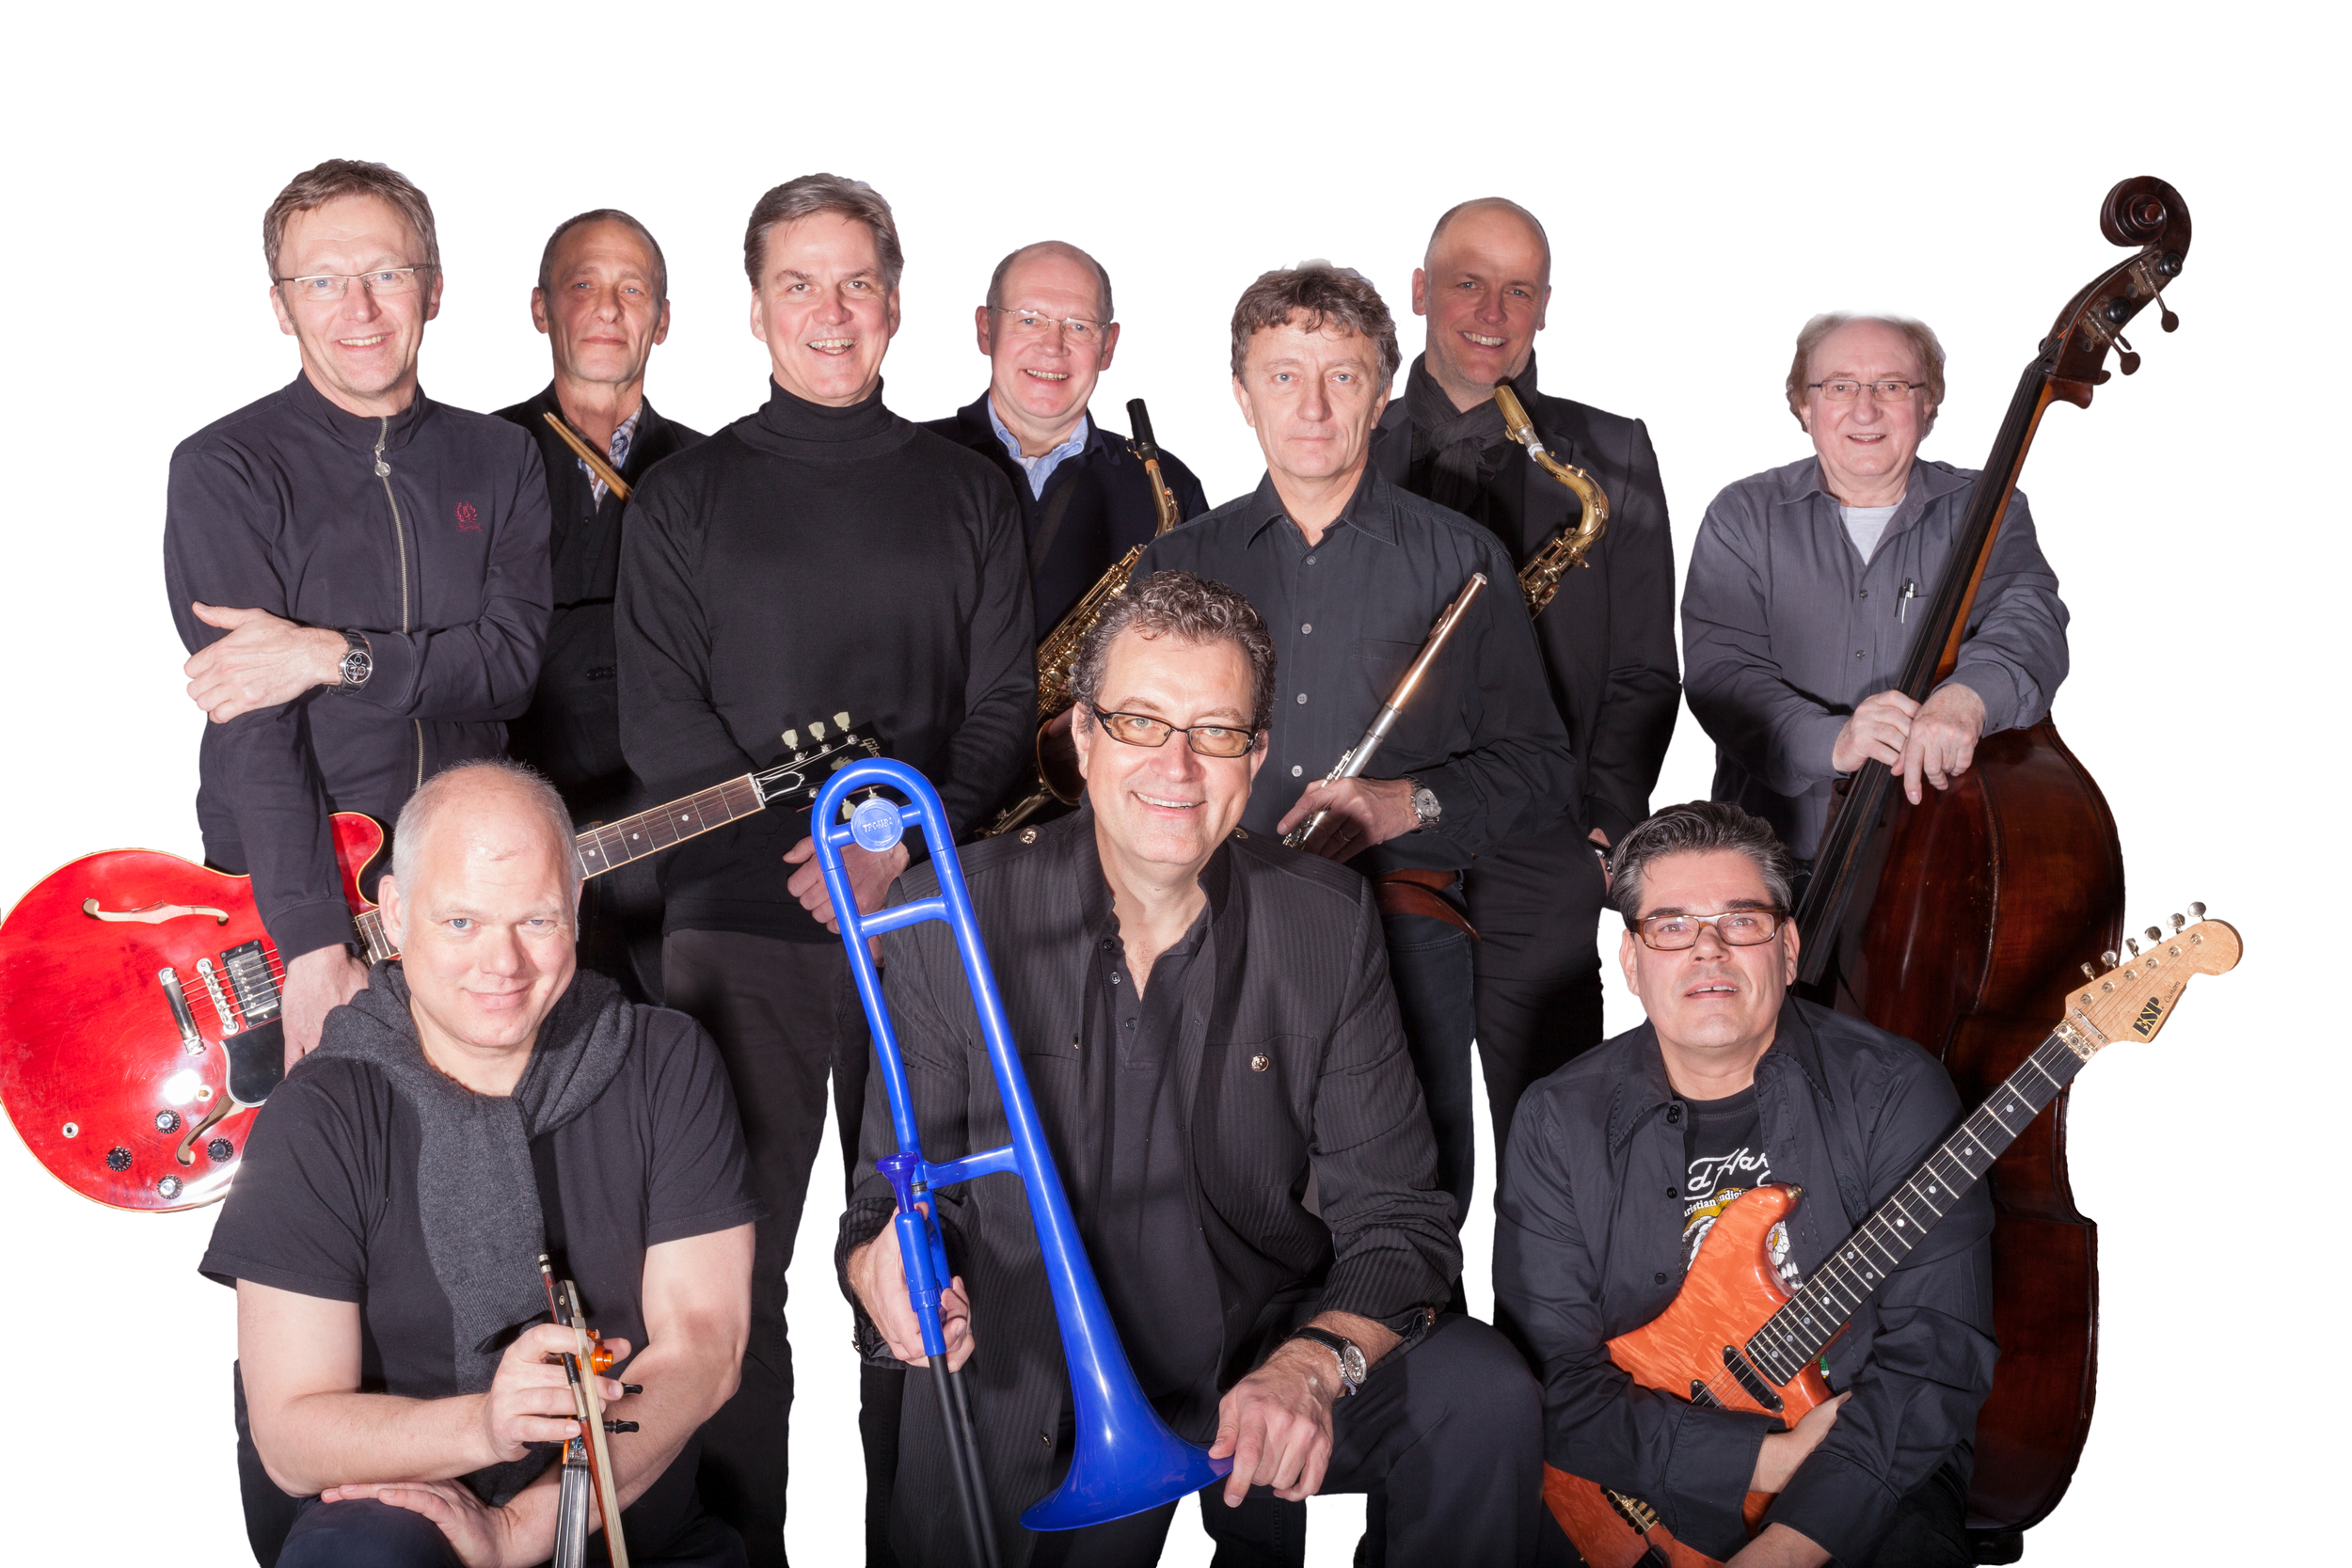 21.06.2014, Rotary Jazztett, Burh Vischering, Lüdinghausen